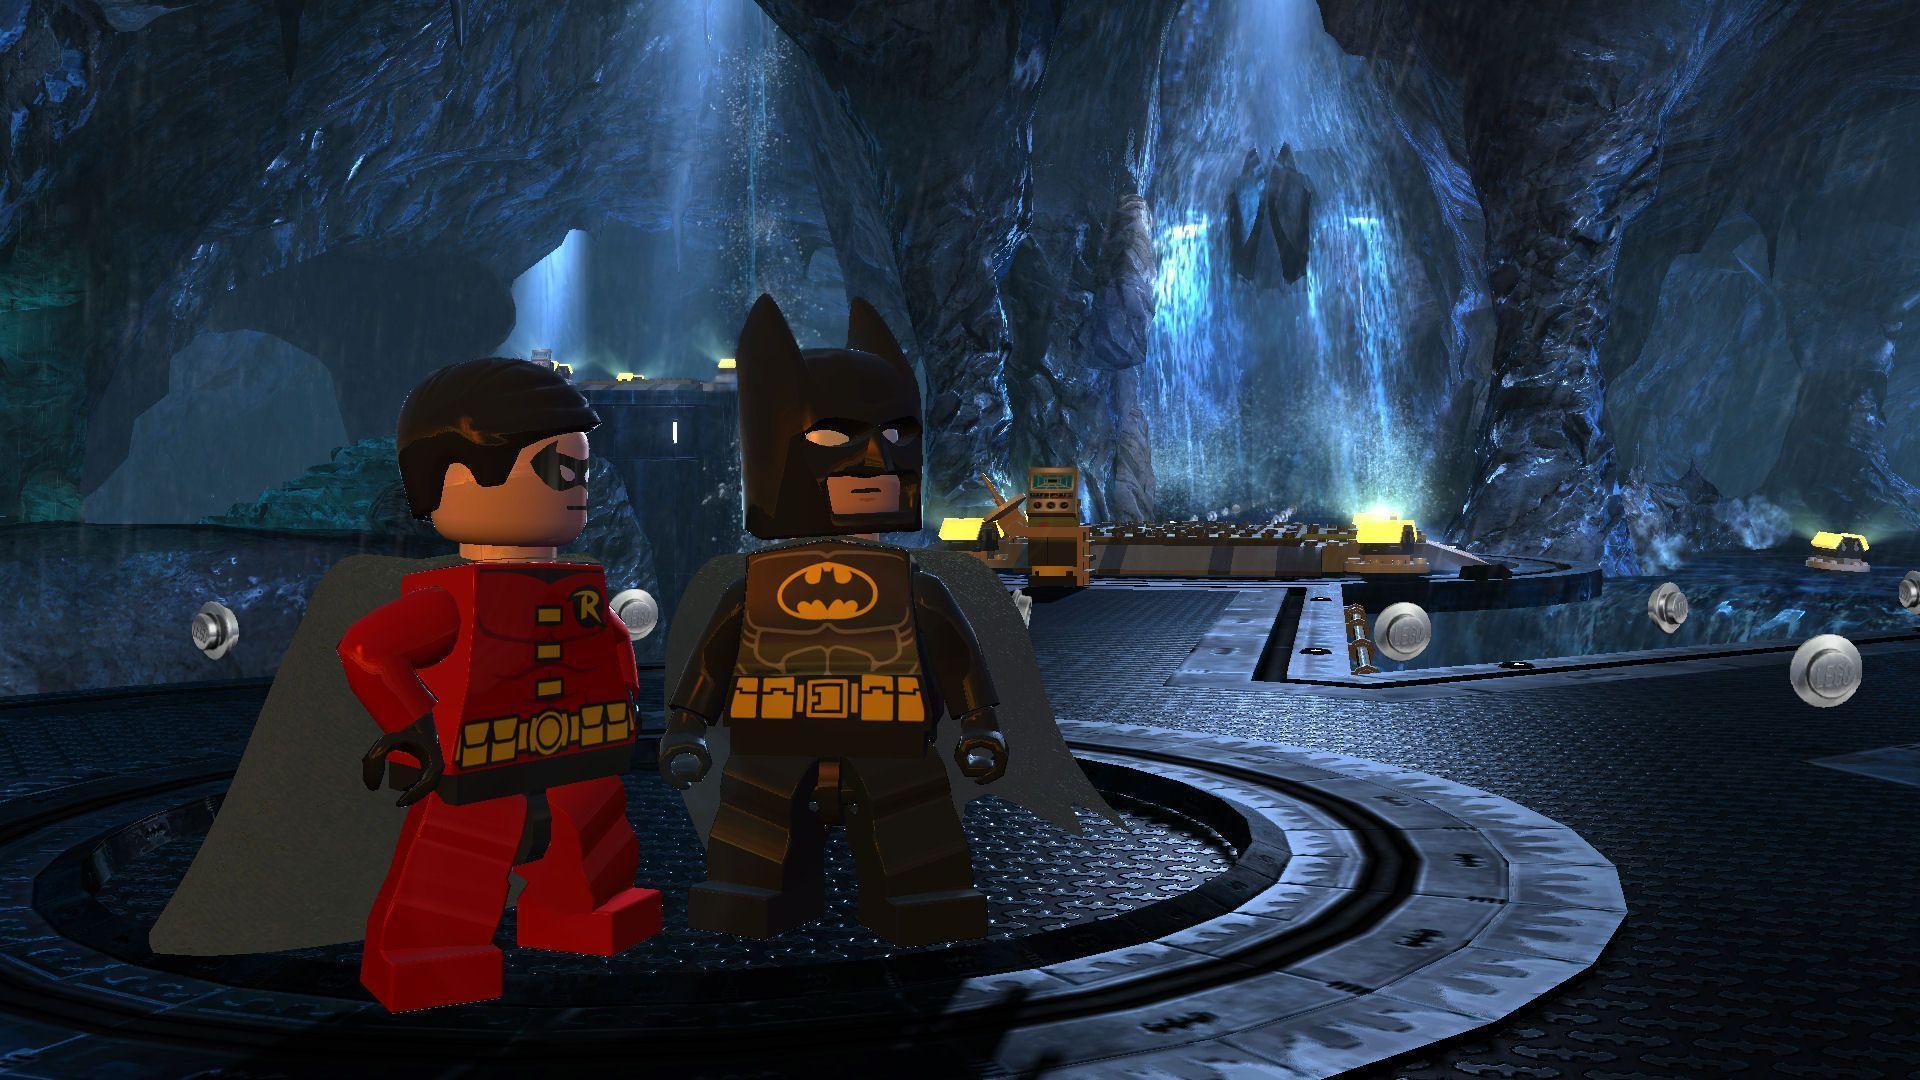 lego batman 2 wallpaper flash - photo #30